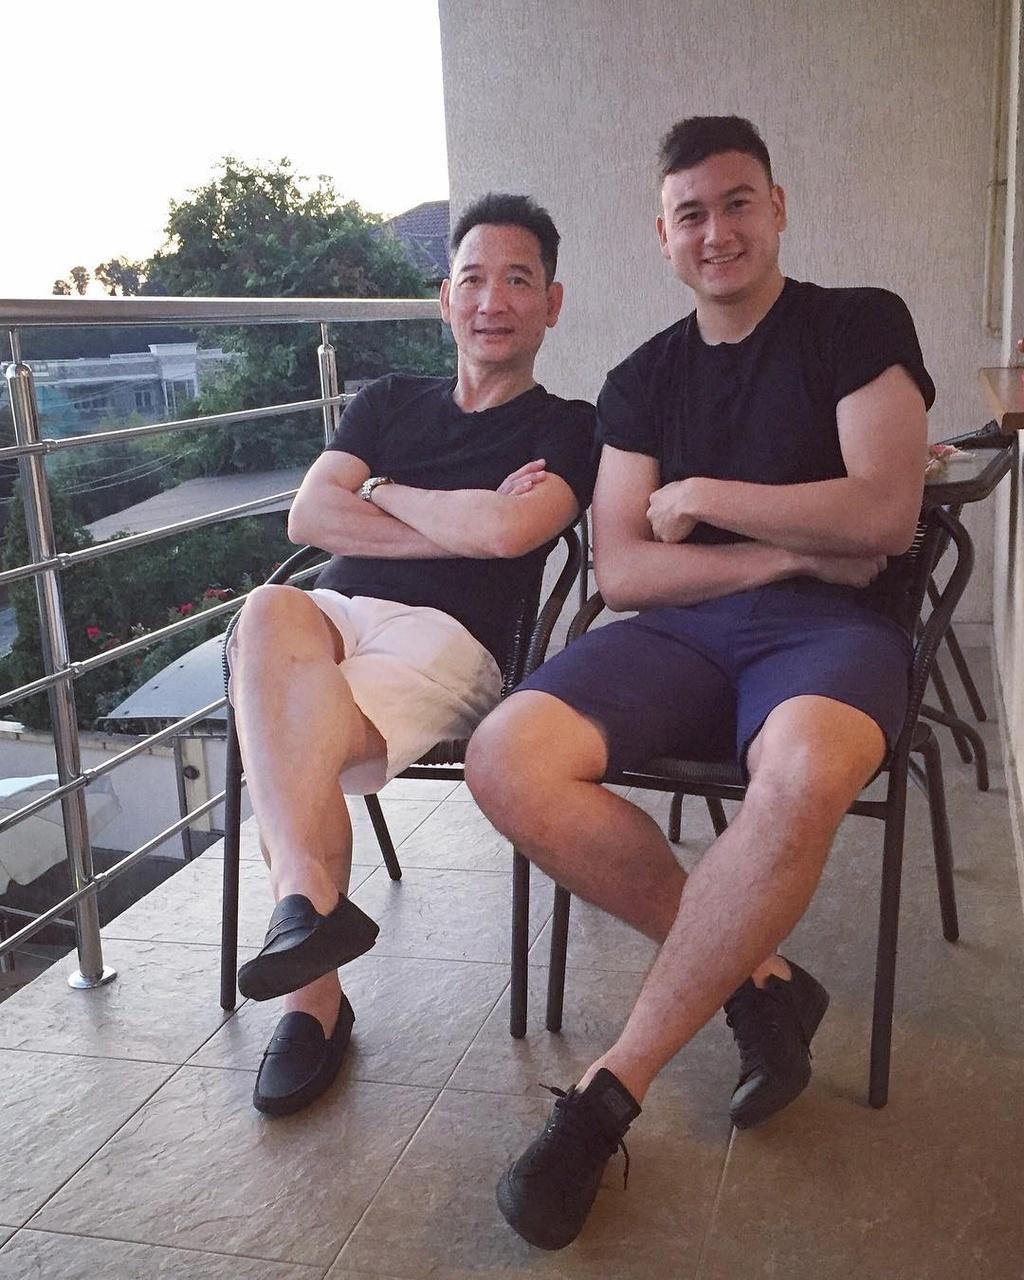 Cha thu mon Van Lam: 'Chau da danh doi 8 nam de co 90 phut chung ket' hinh anh 1